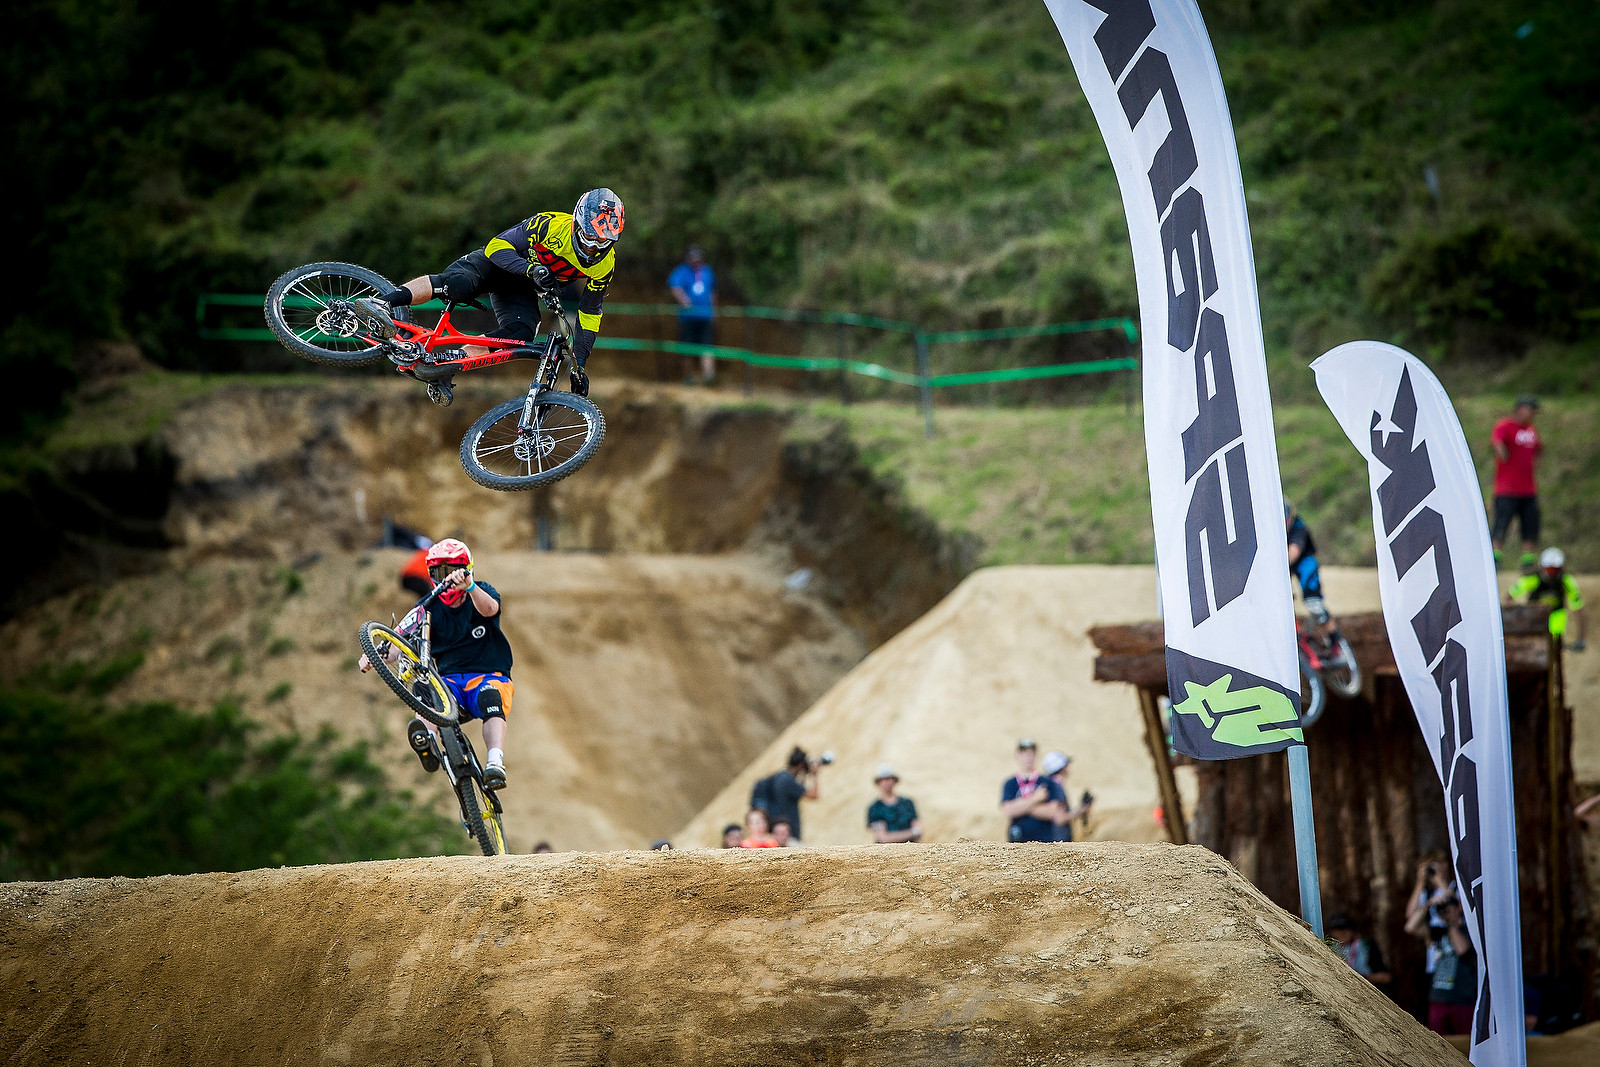 George Brannigan - Whip Off Madness from Crankworx NZ - Mountain Biking Pictures - Vital MTB